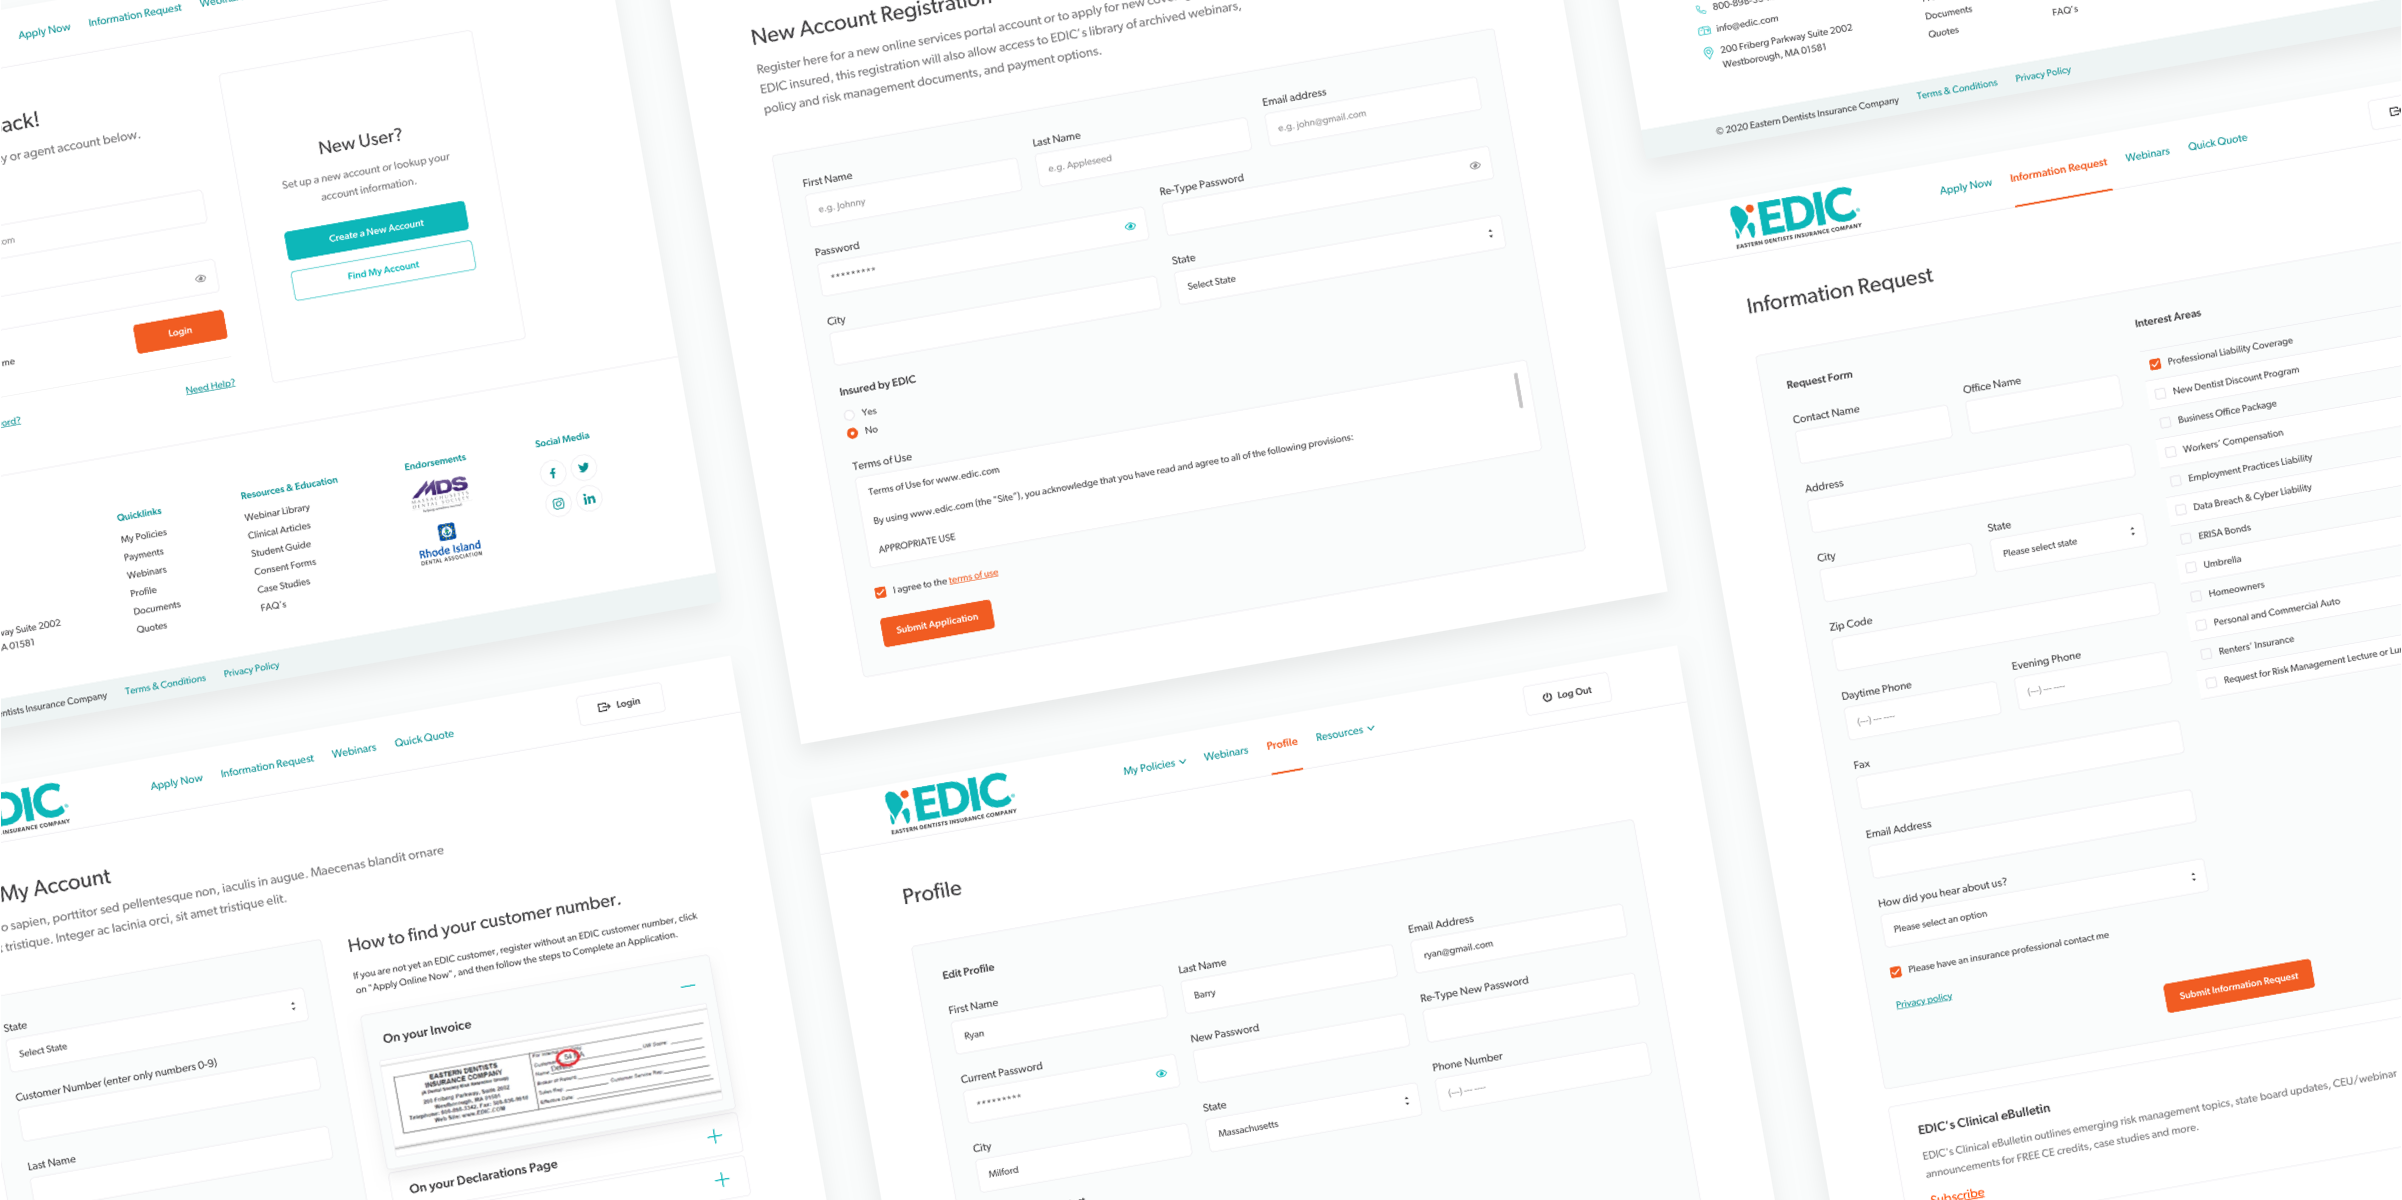 EDIC portal screen image